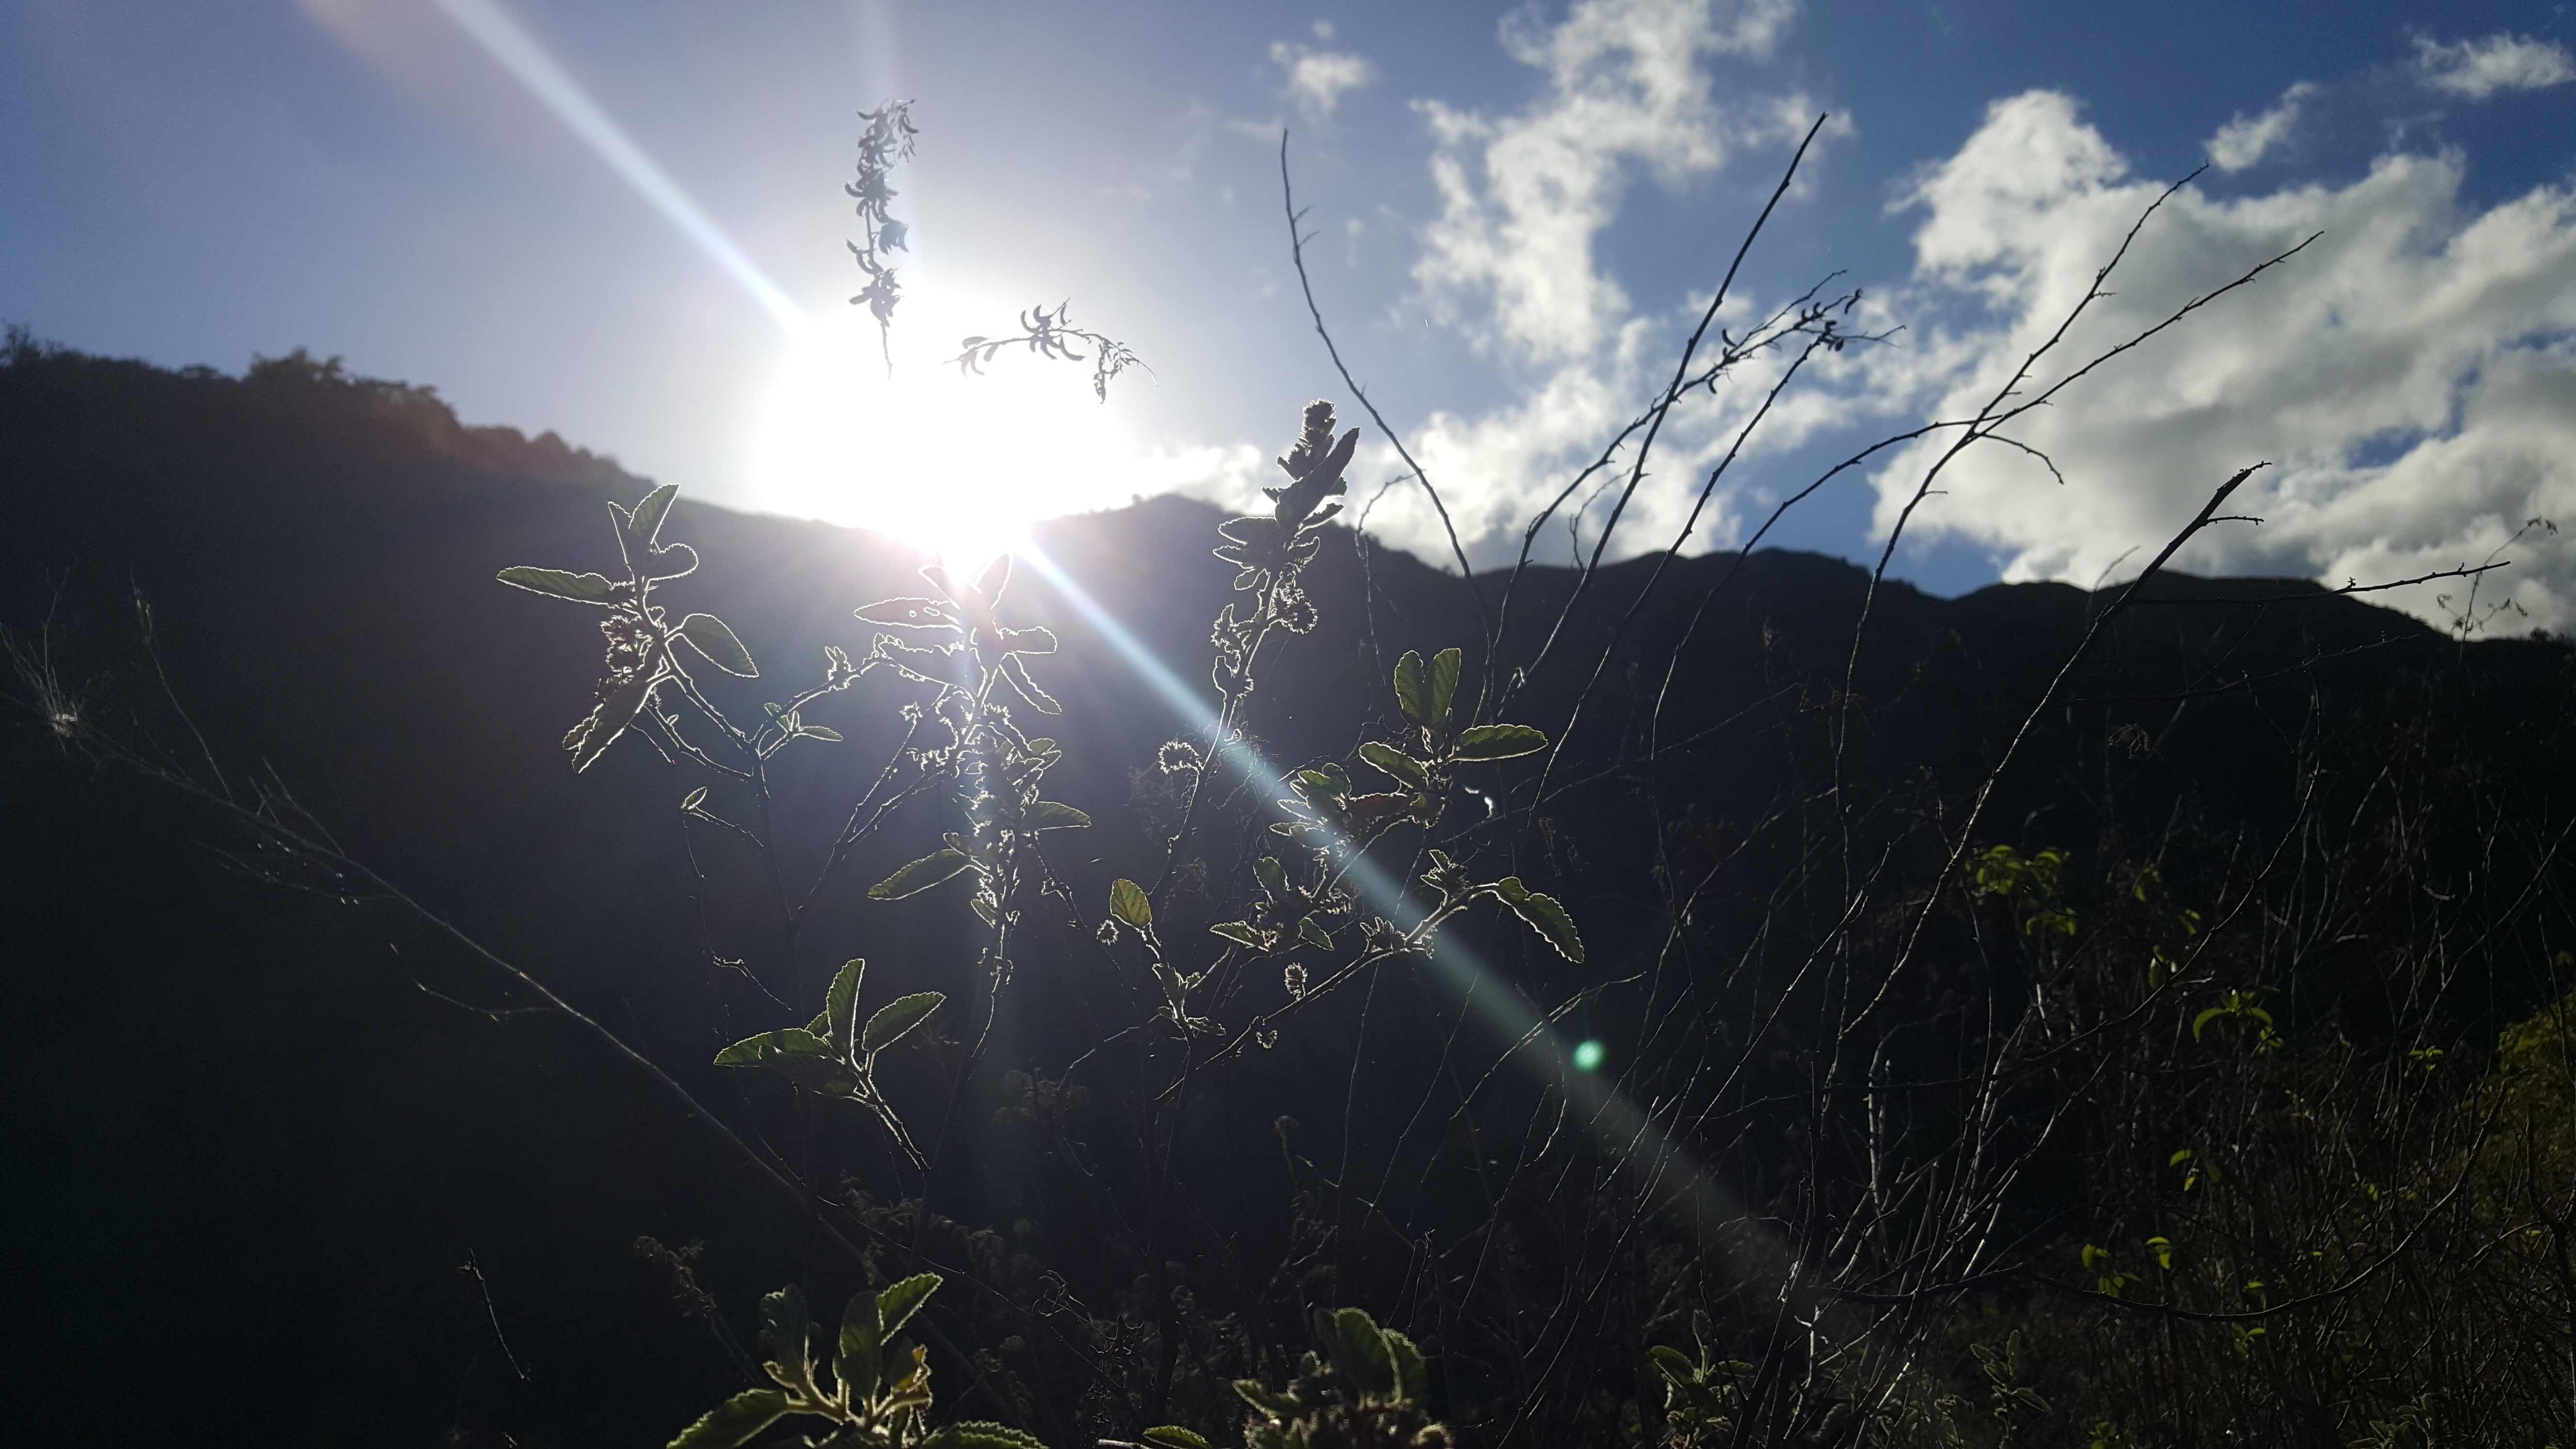 https://tahititourisme.com.au/wp-content/uploads/2020/09/20180519_074342.jpg